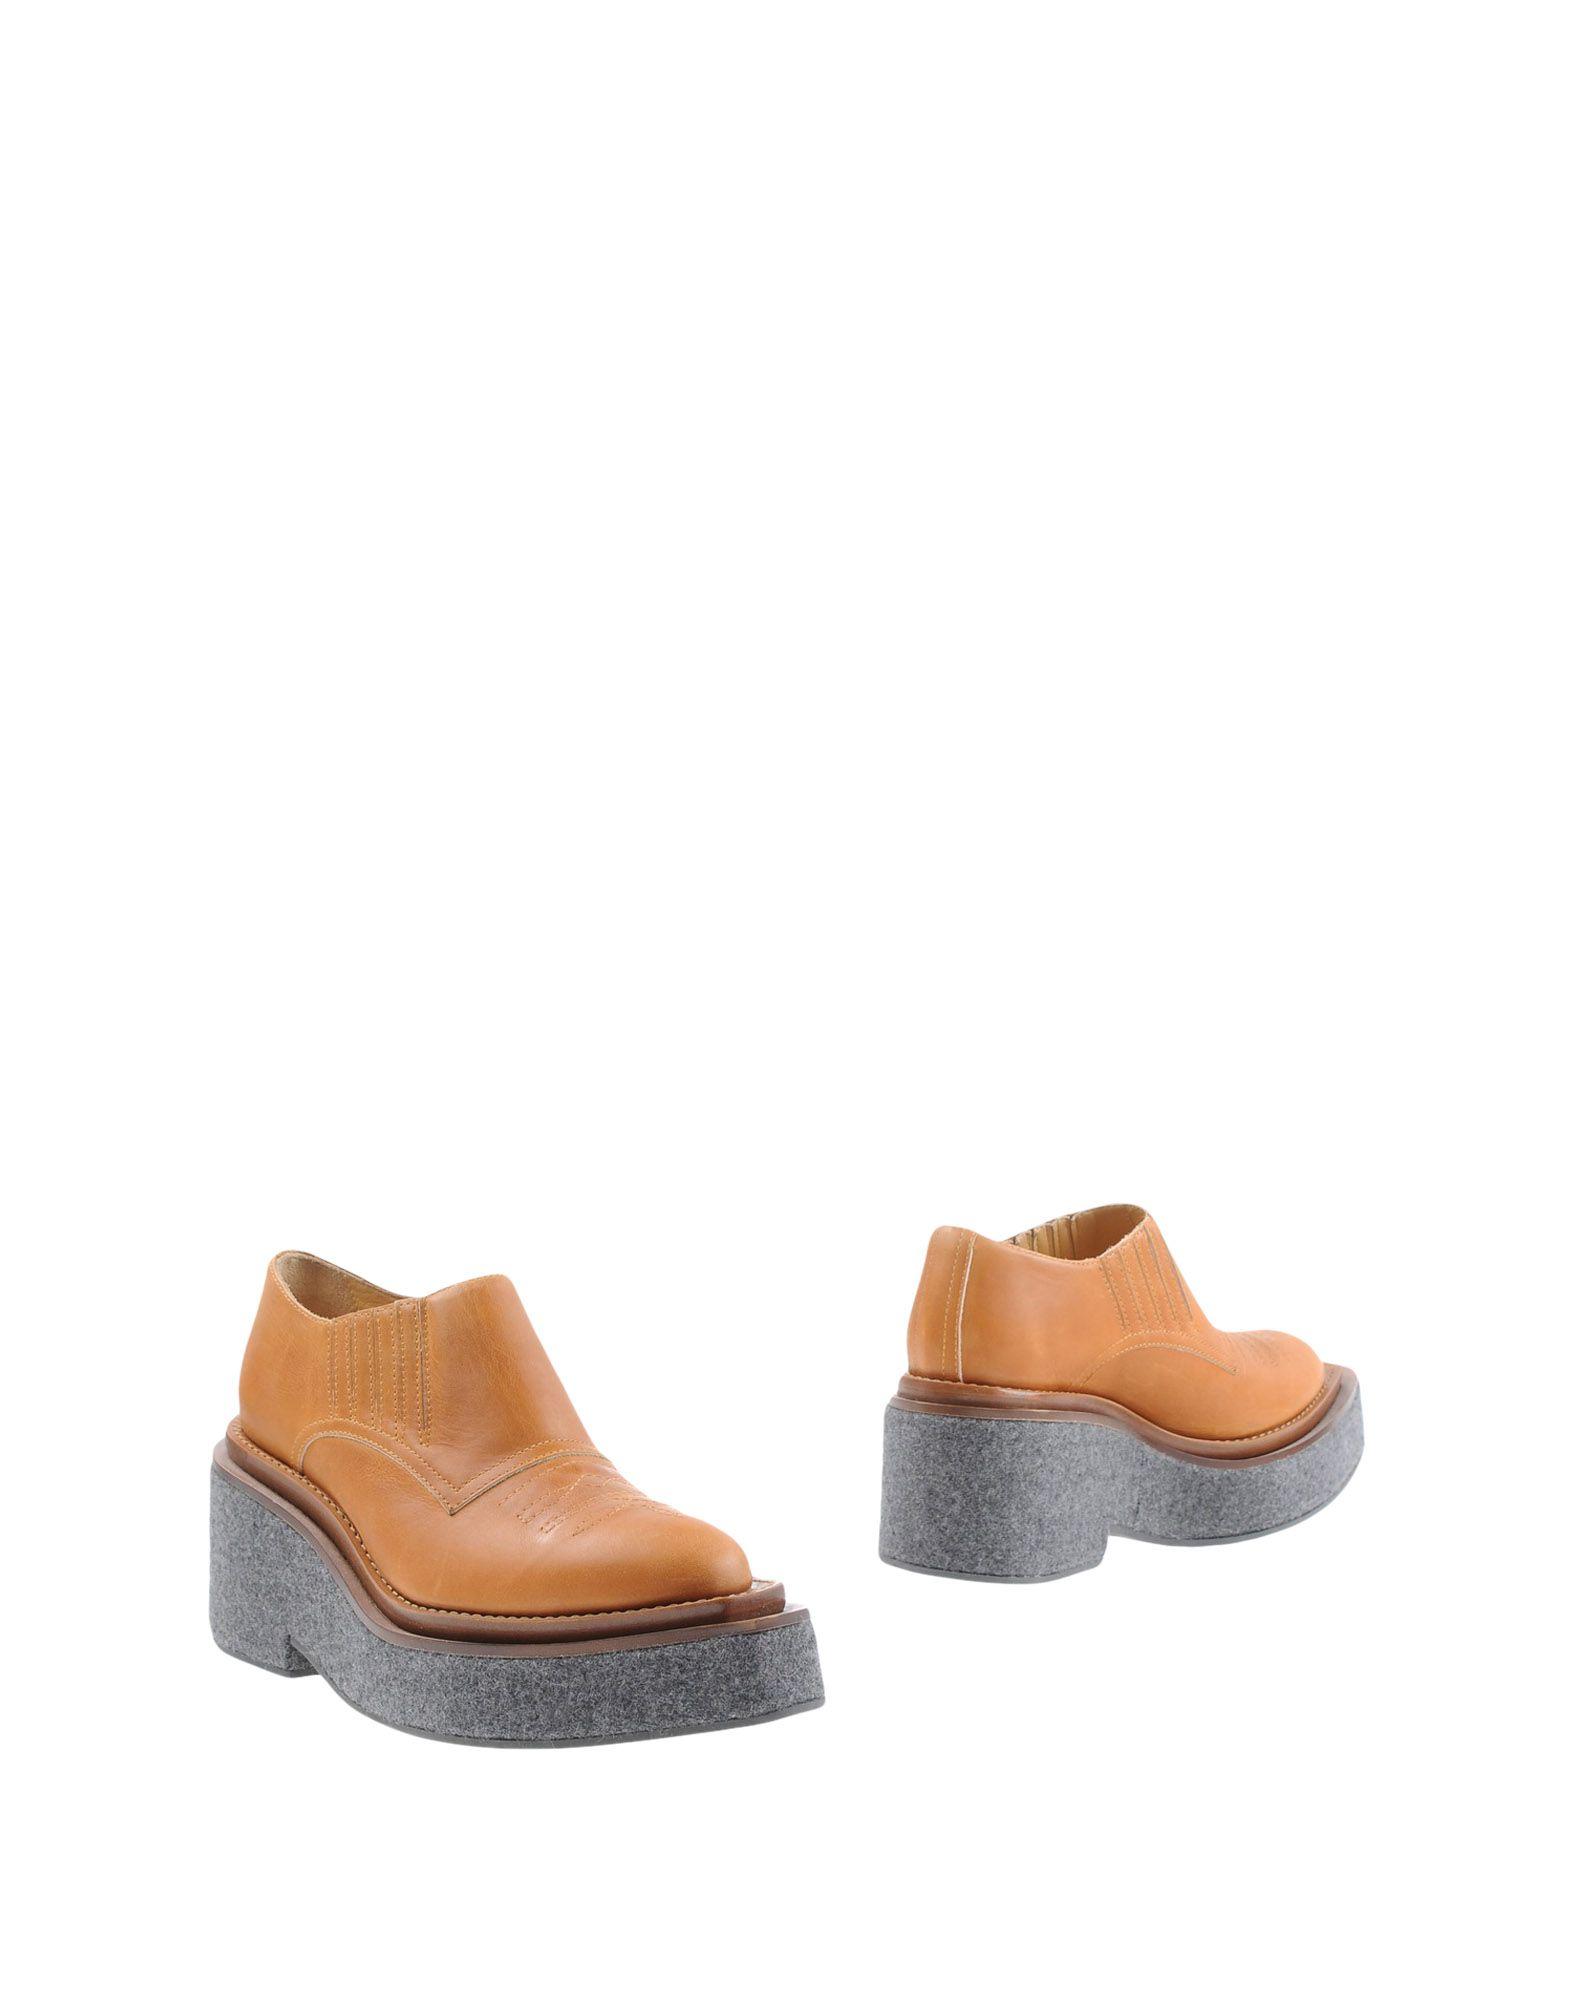 MM6 MAISON MARGIELA Ботинки maison margiela ботинки